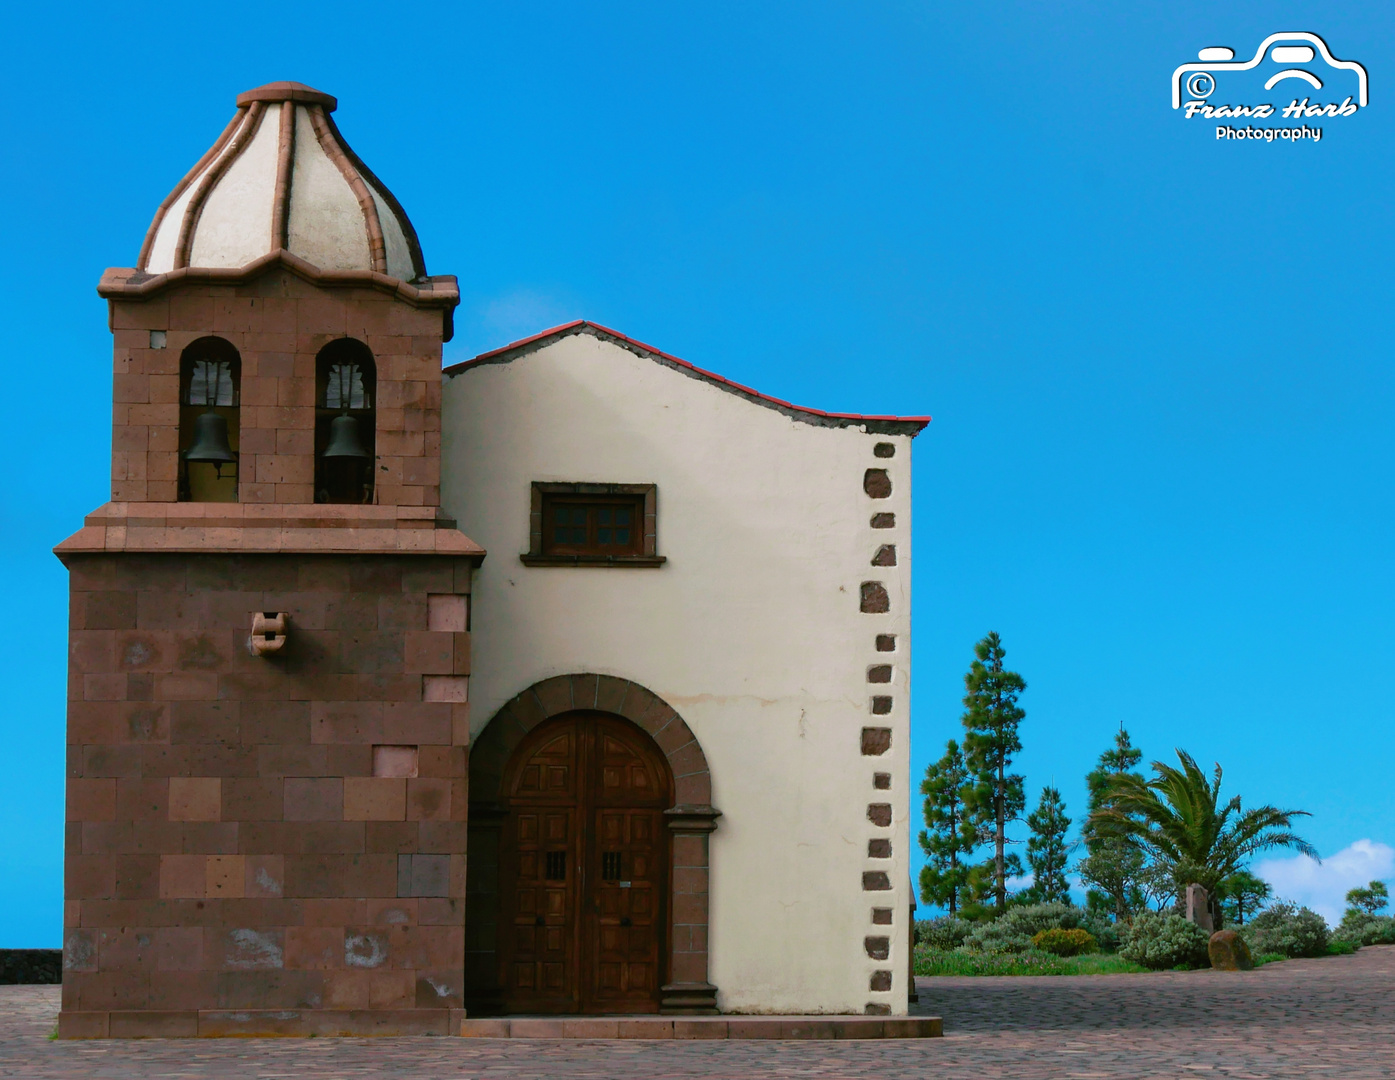 Spanien, Kanarische Inseln, La Gomera, Mirador de Igualero: Kleine Kapelle